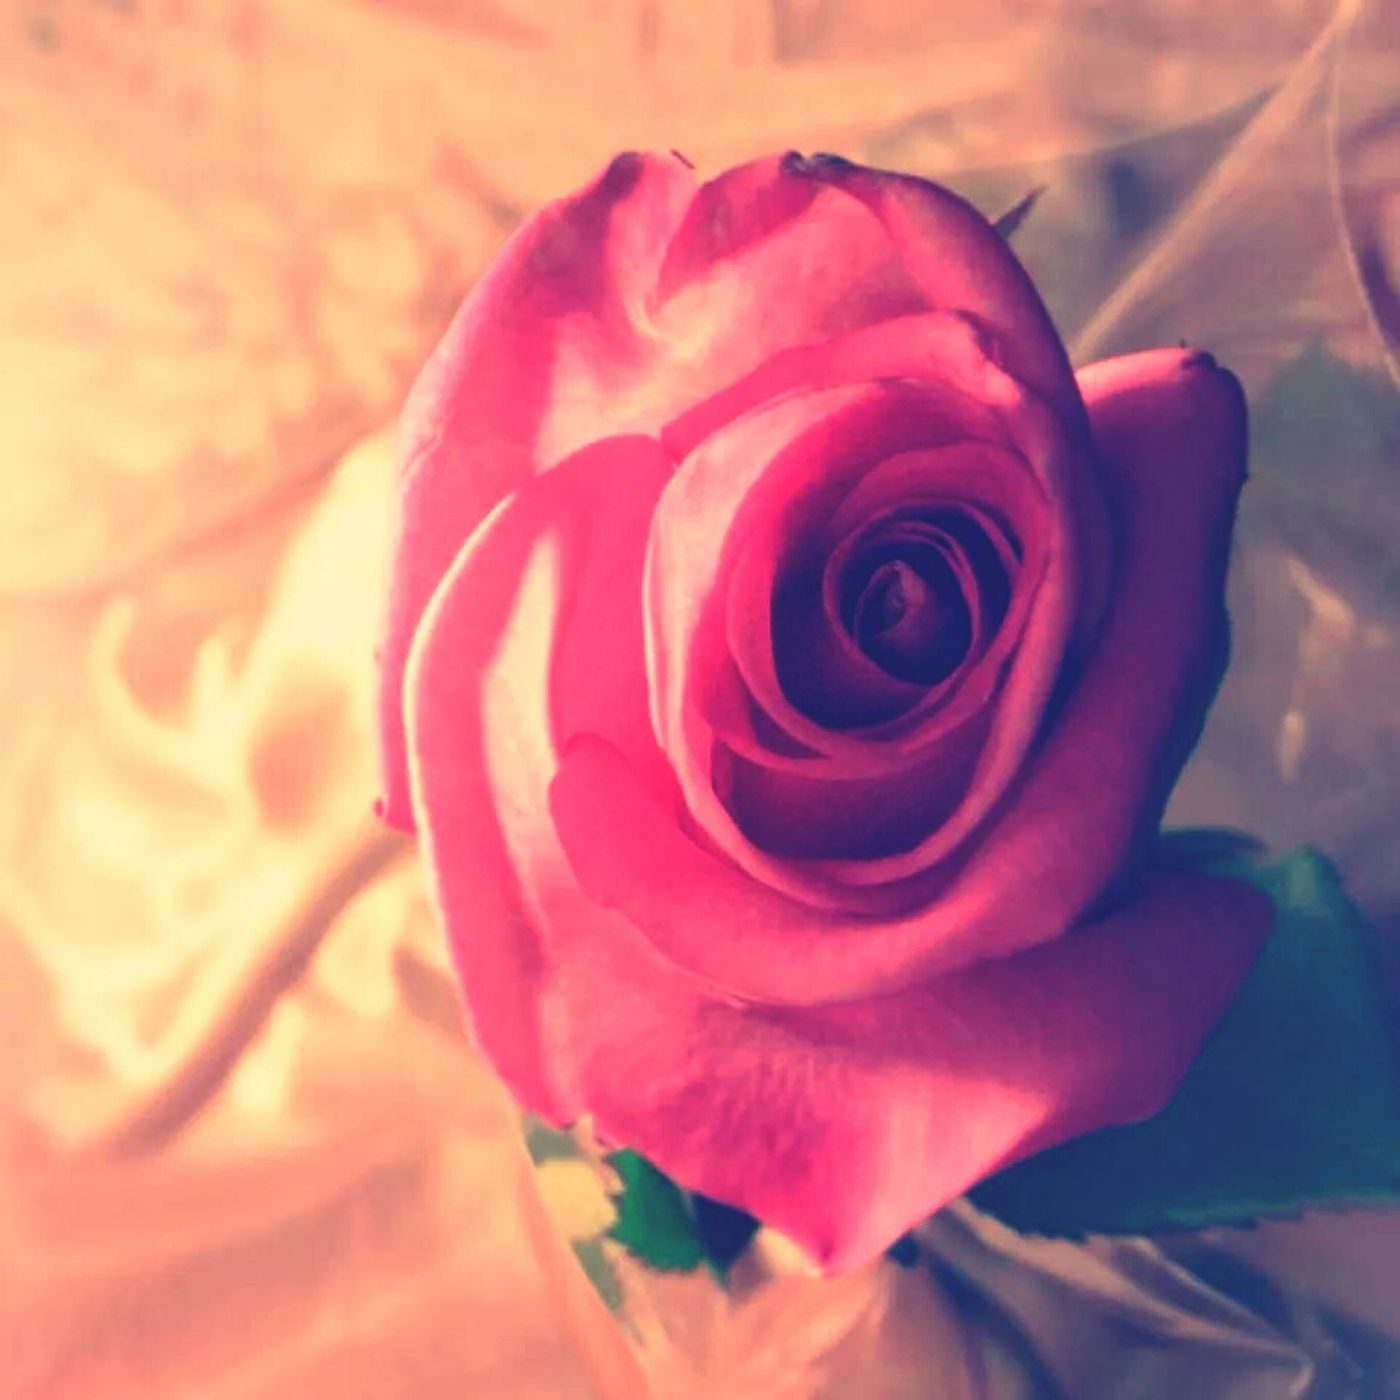 Pink Rose Rose🌹 Light Bright Rose